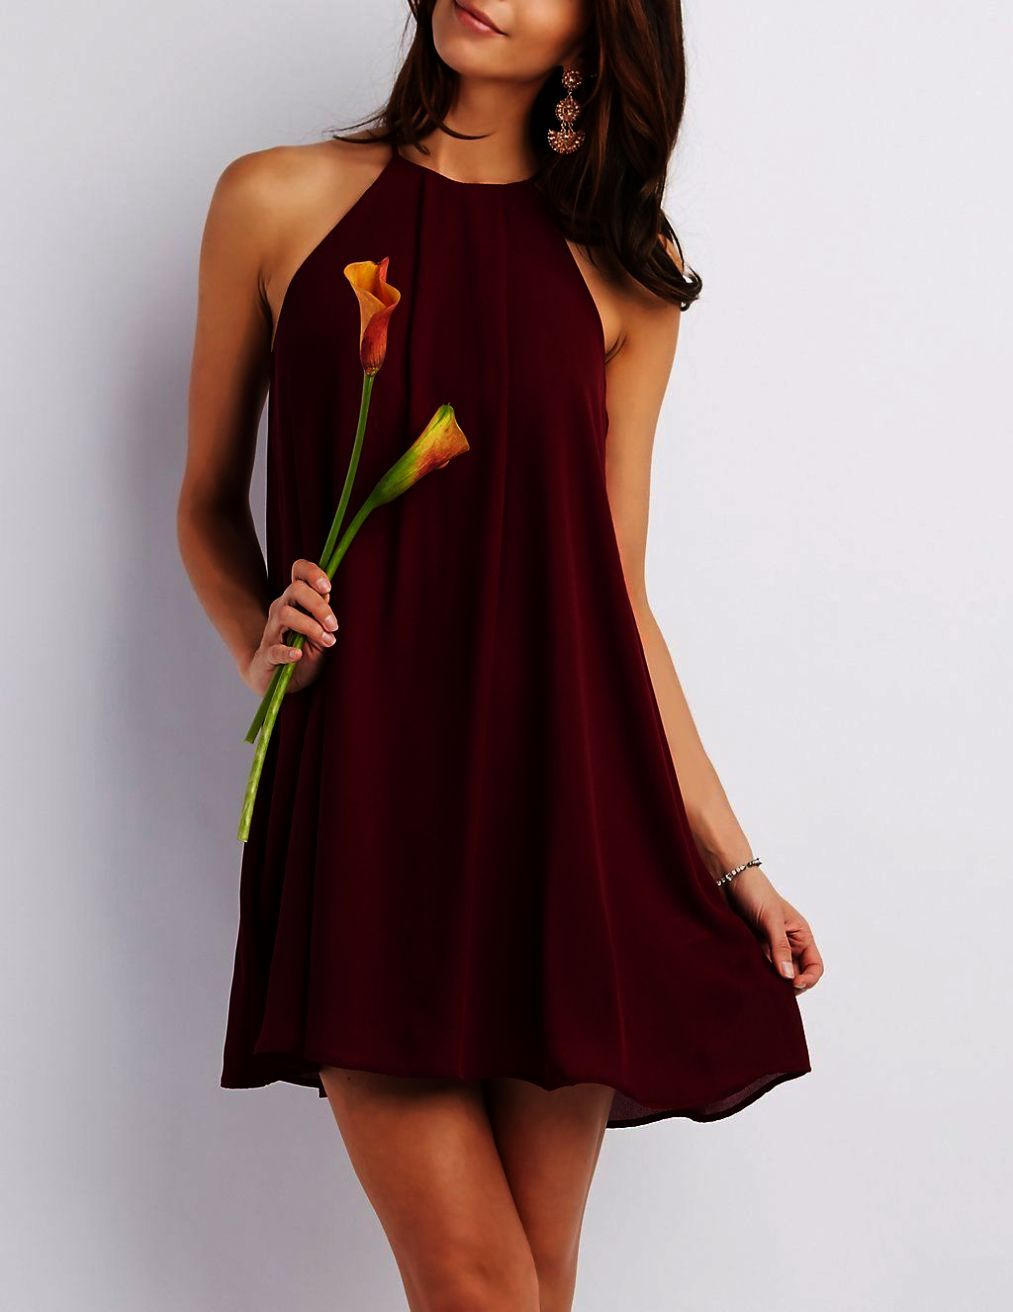 Little black dress asos tight dress party dresses pinterest